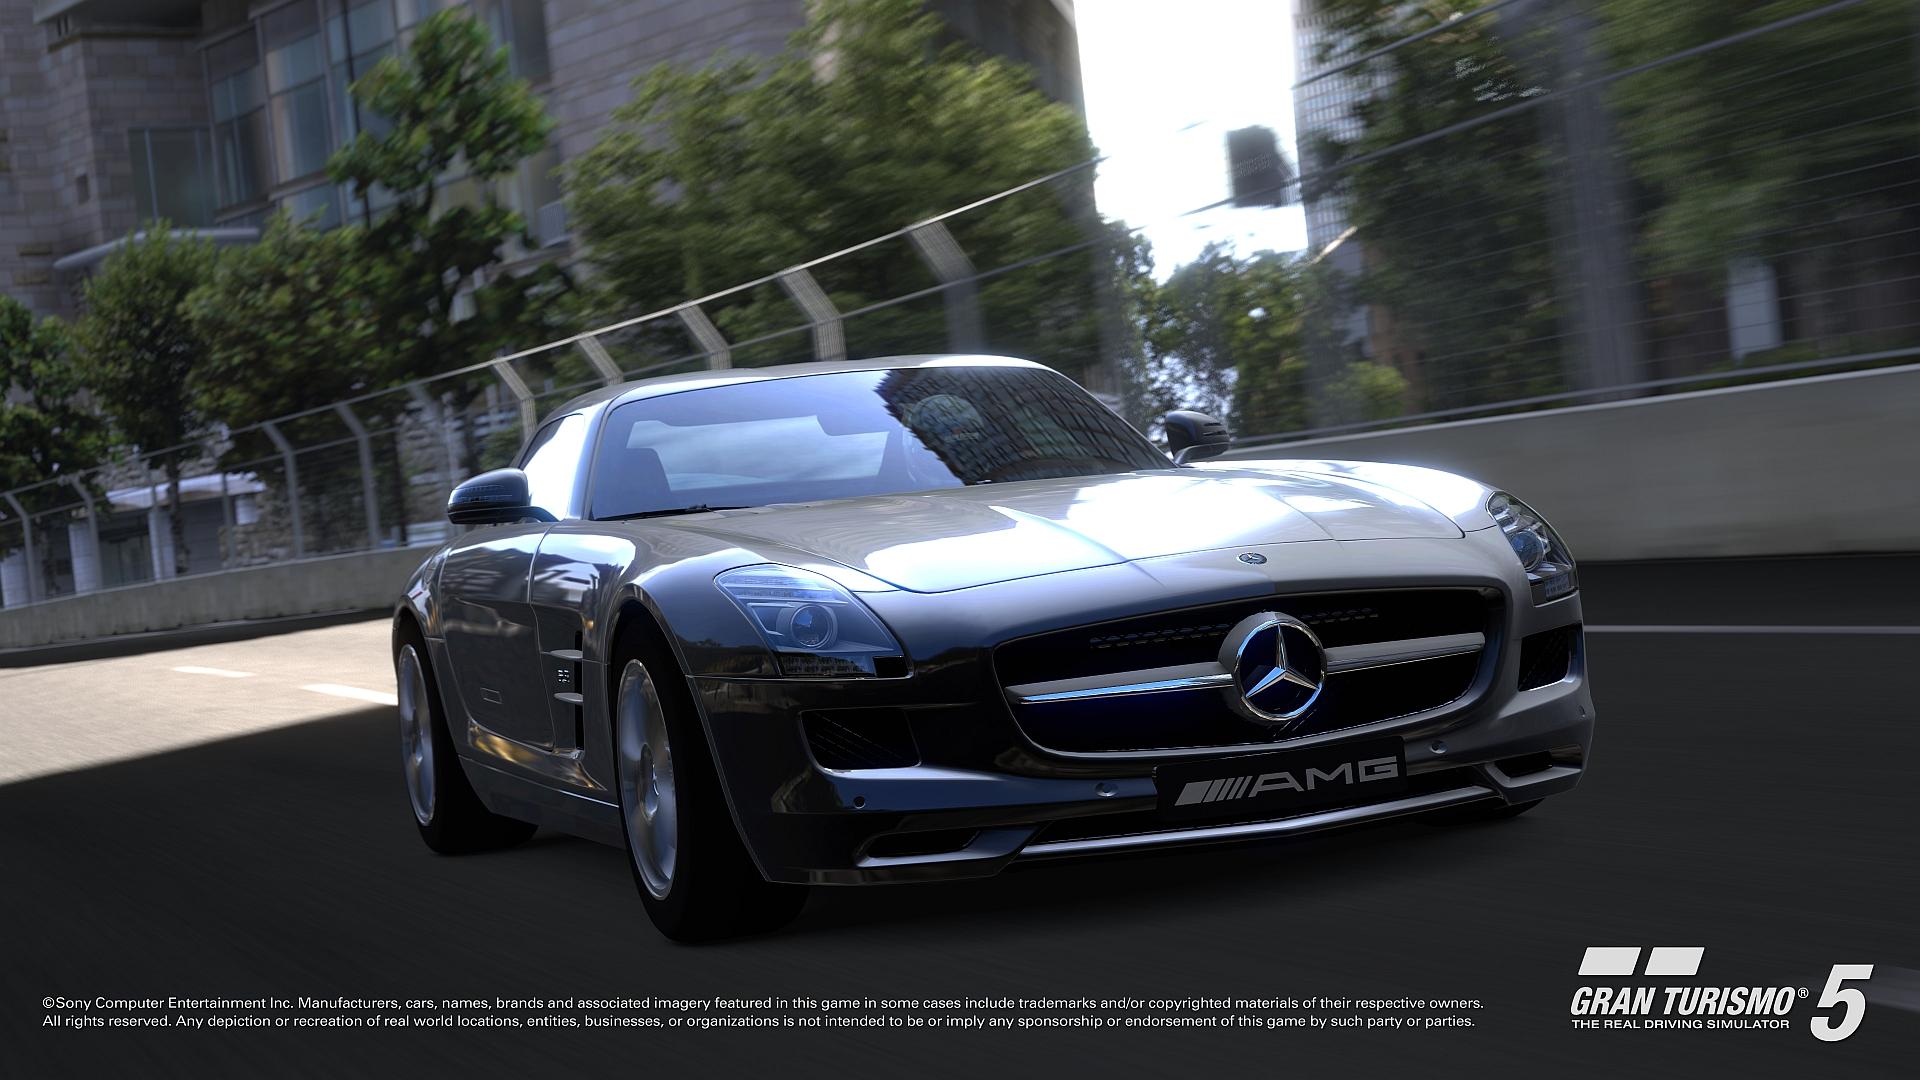 gran turismo 5 new screenshots sim racing news. Black Bedroom Furniture Sets. Home Design Ideas